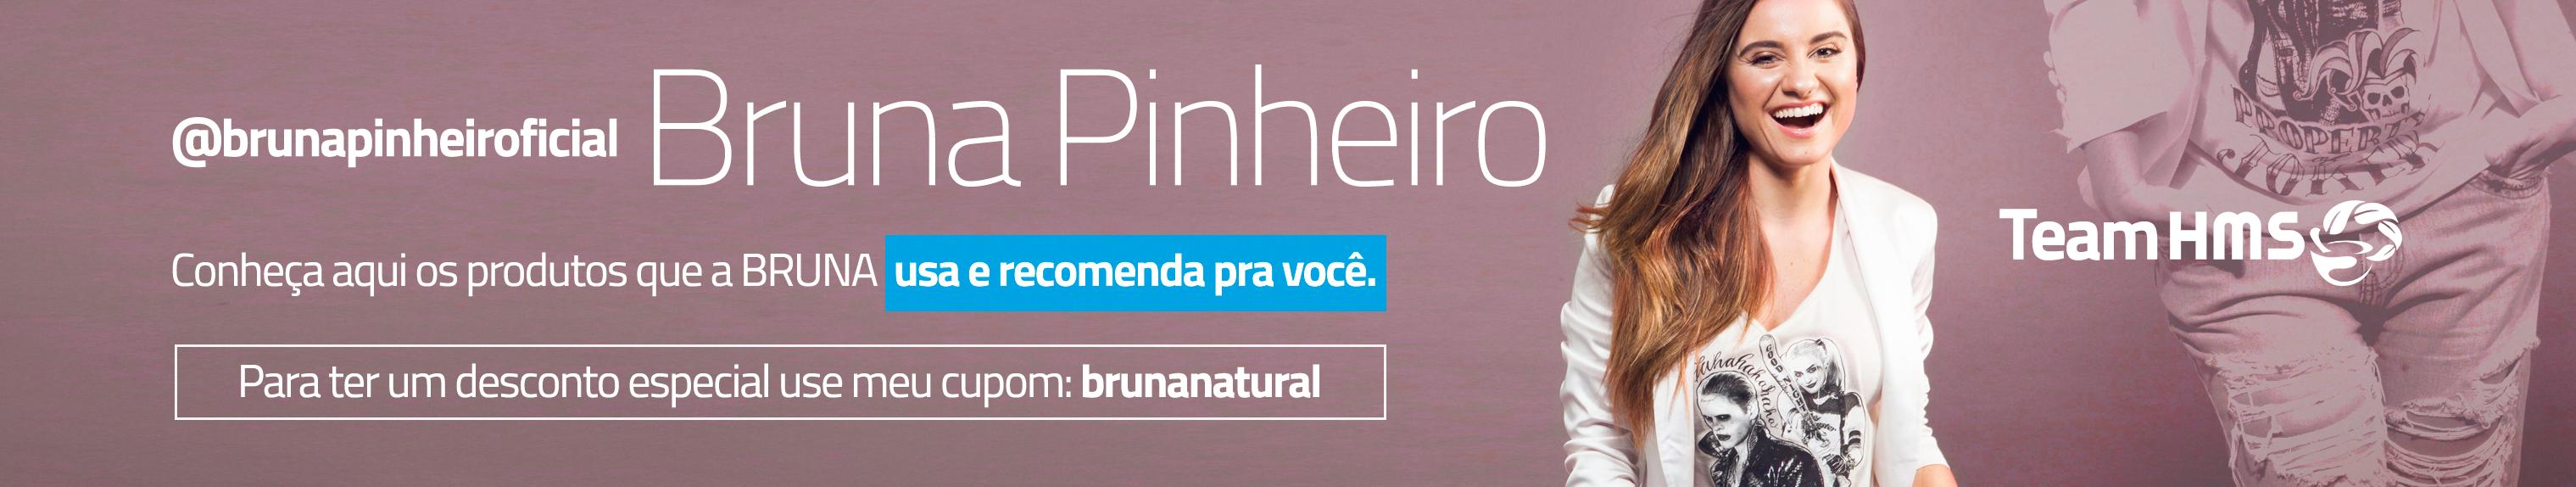 banner Bruna Pinheiro